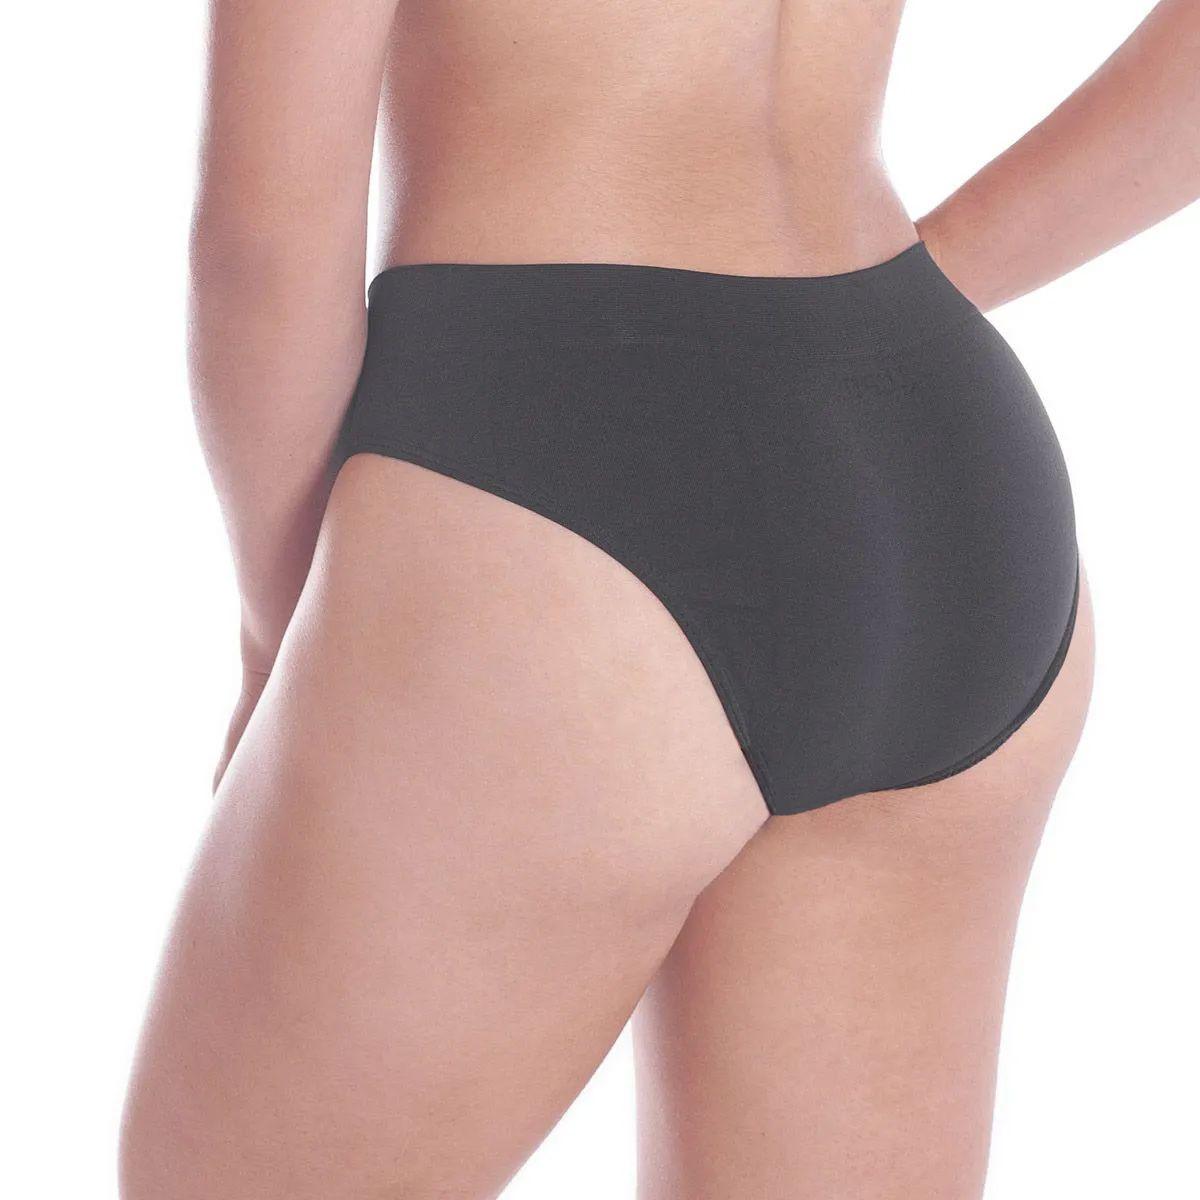 Calcinha microfibra cós largo moda intima lingerie tanga feminina Loba Lupo